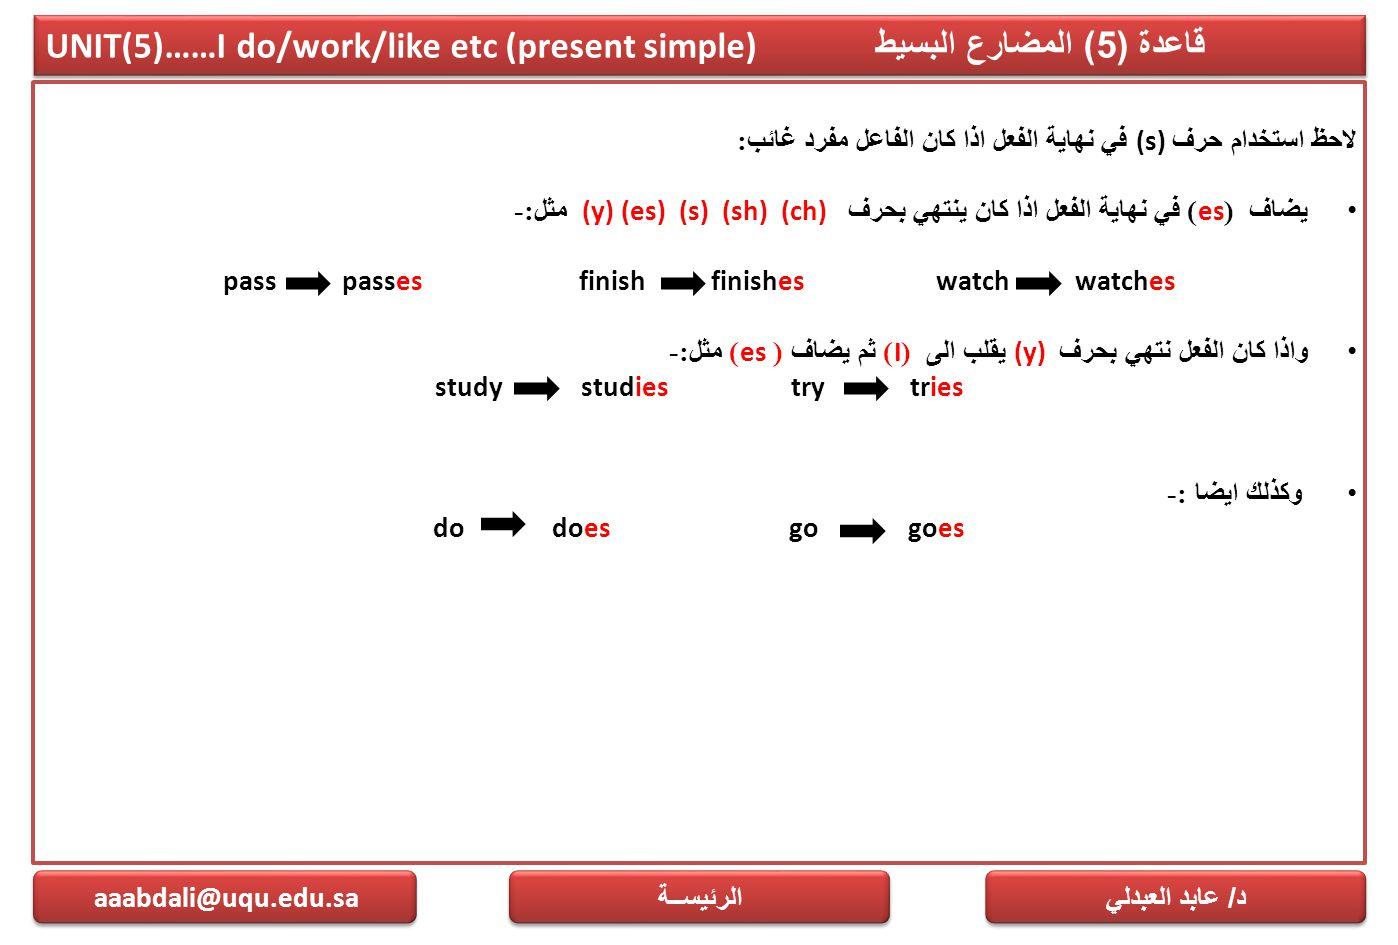 UNIT(5)……I do/work/like etc (present simple) قاعدة (5) المضارع البسيط لاحظ استخدام حرف (s) في نهاية الفعل اذا كان الفاعل مفرد غائب : يضاف (es) في نهاي